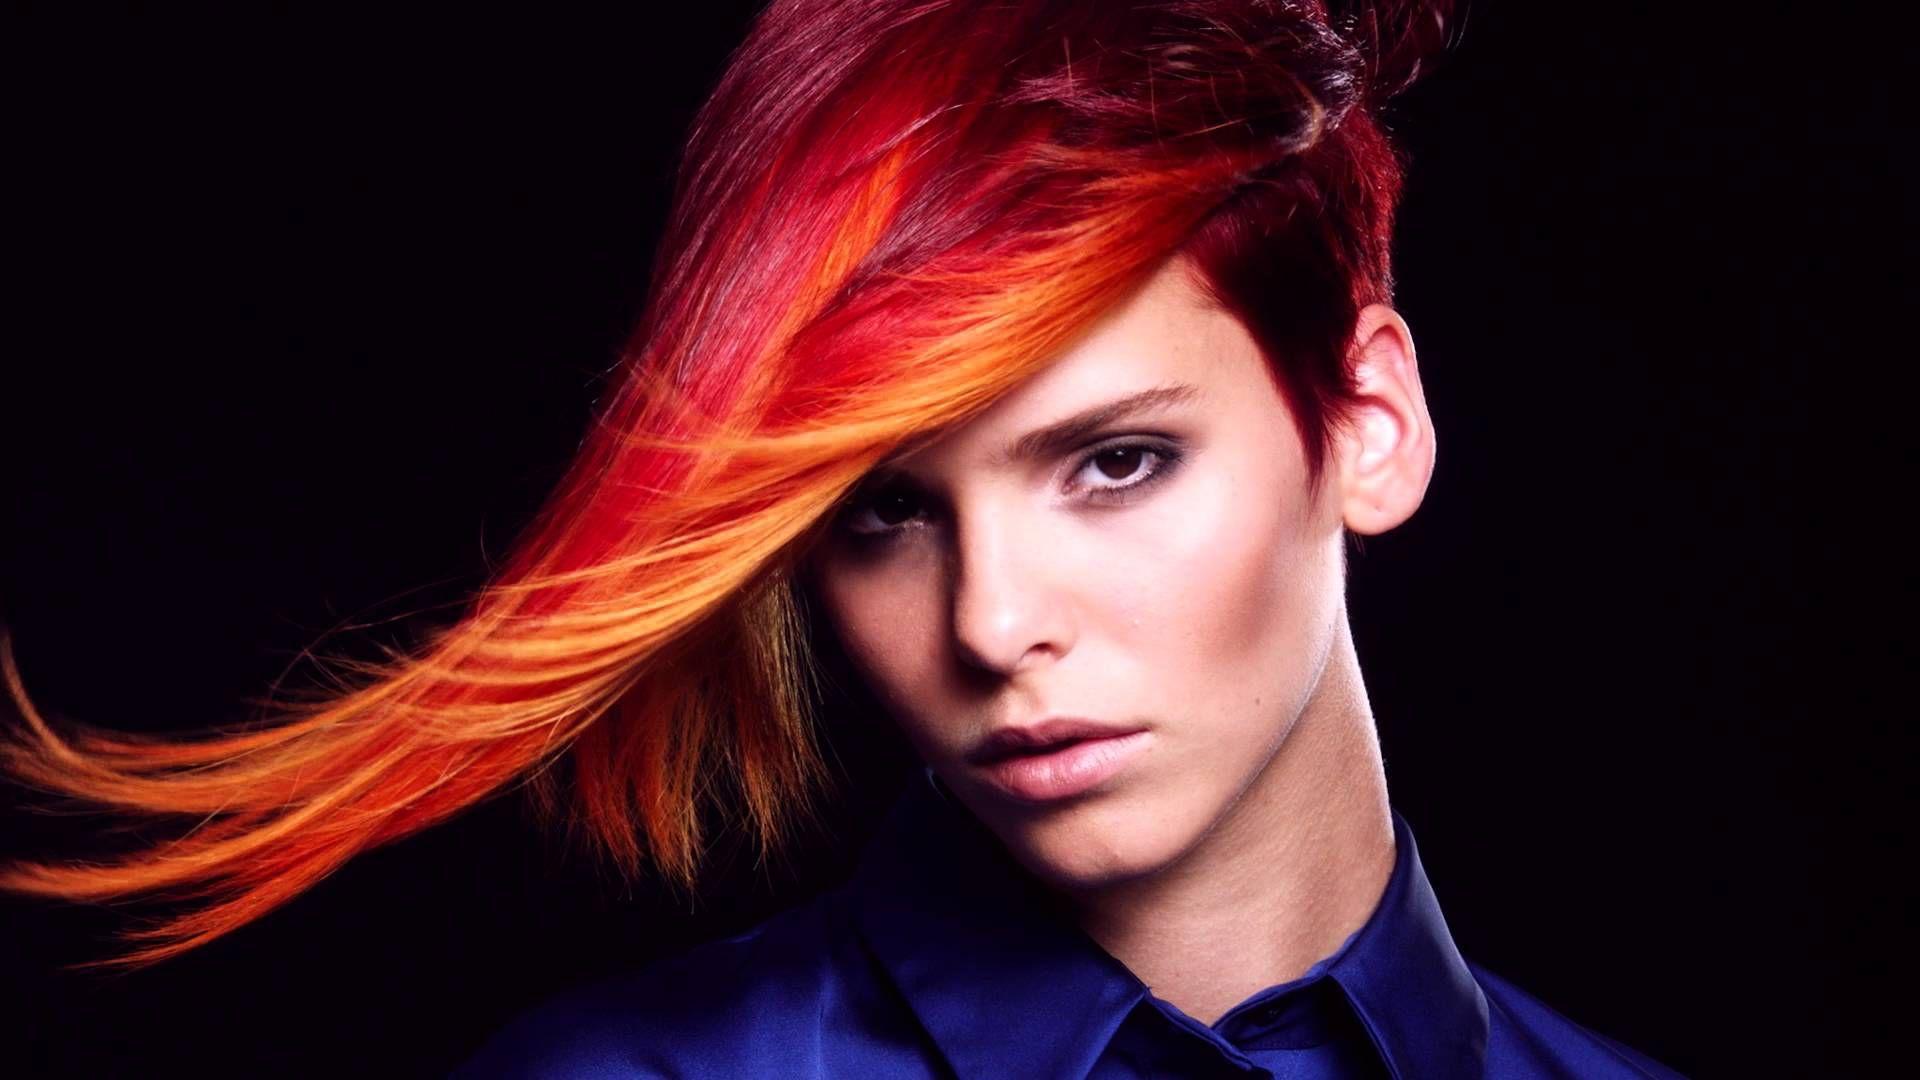 Redheads on fire смотреть онлайн